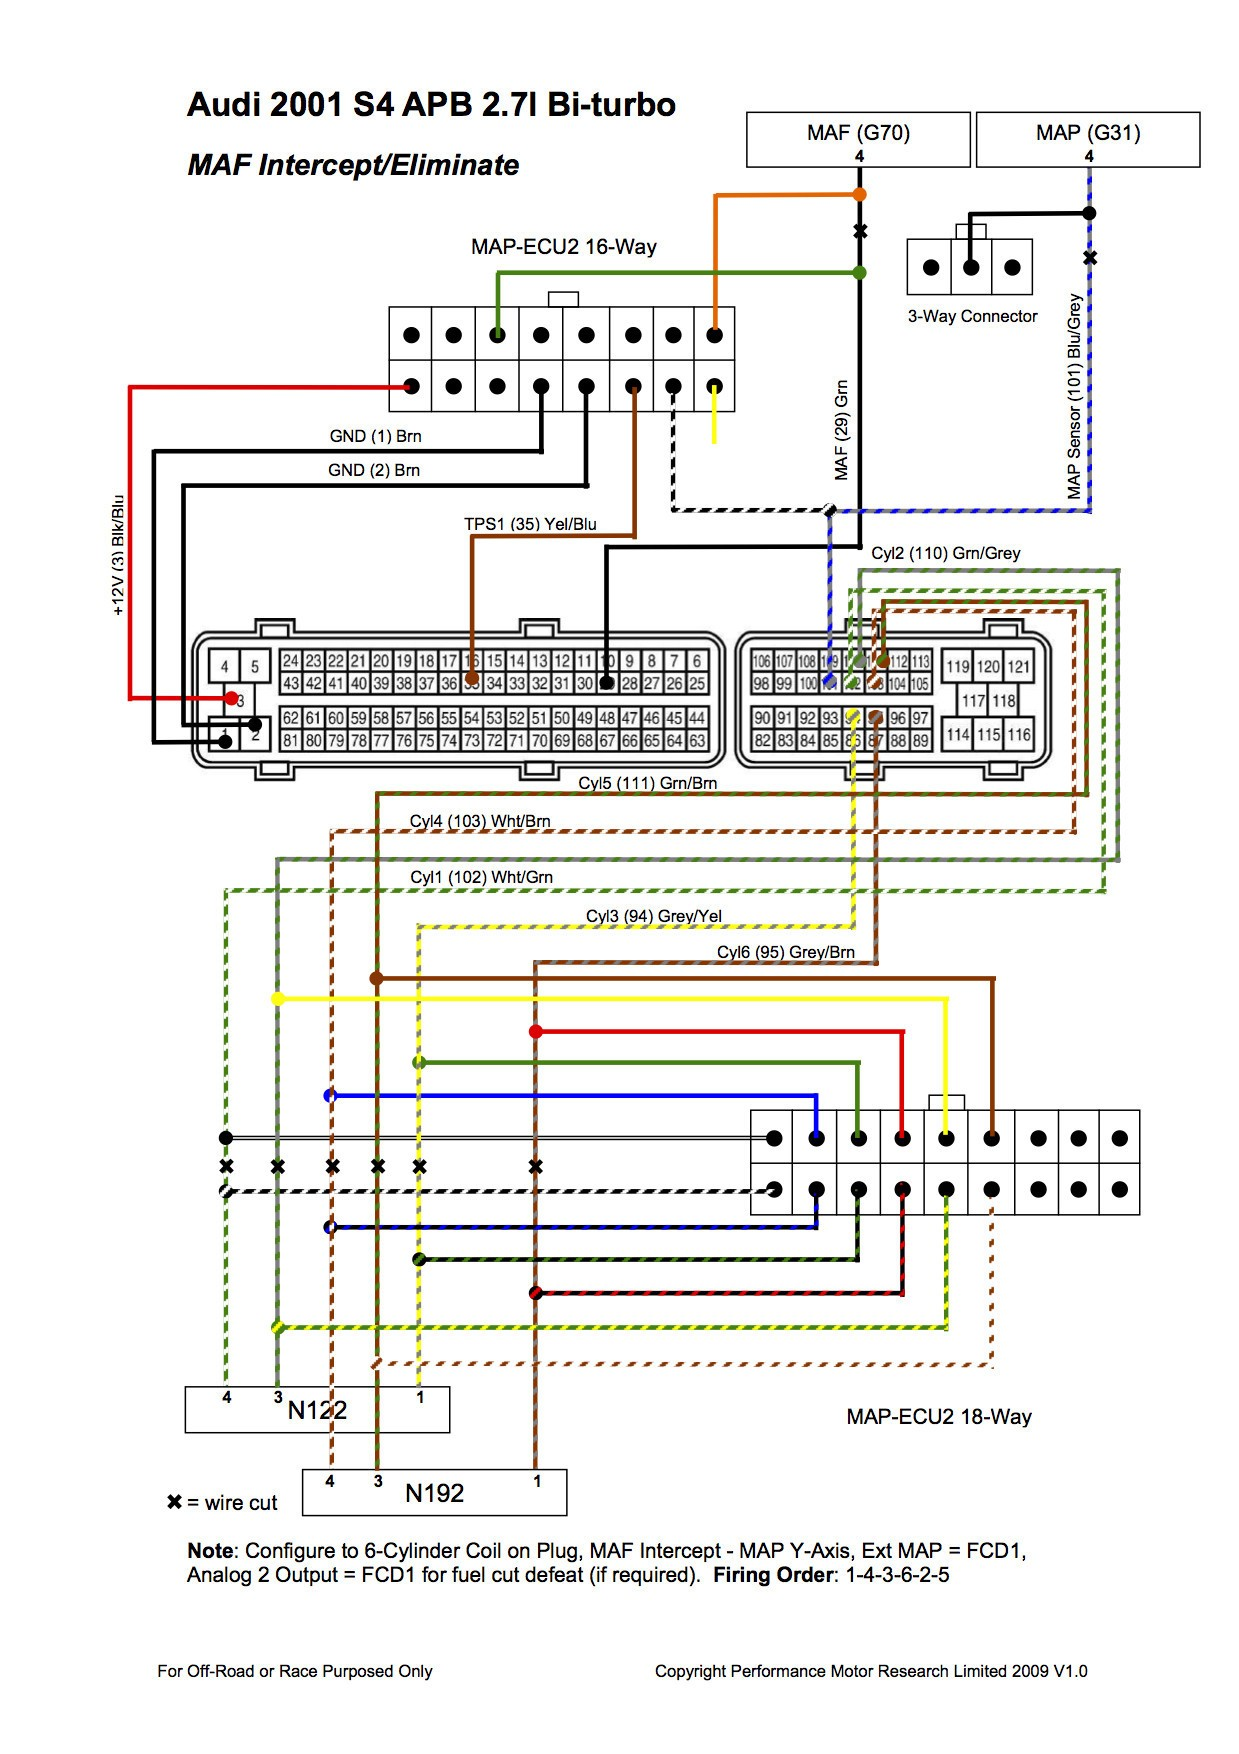 [DIAGRAM_38ZD]  VN_5077] Toyota 4Runner Diagrams Schematic Wiring | 97 Toyota 4runner Radio Wiring |  | Teria Xaem Ical Licuk Carn Rious Sand Lukep Oxyt Rmine Shopa Mohammedshrine  Librar Wiring 101